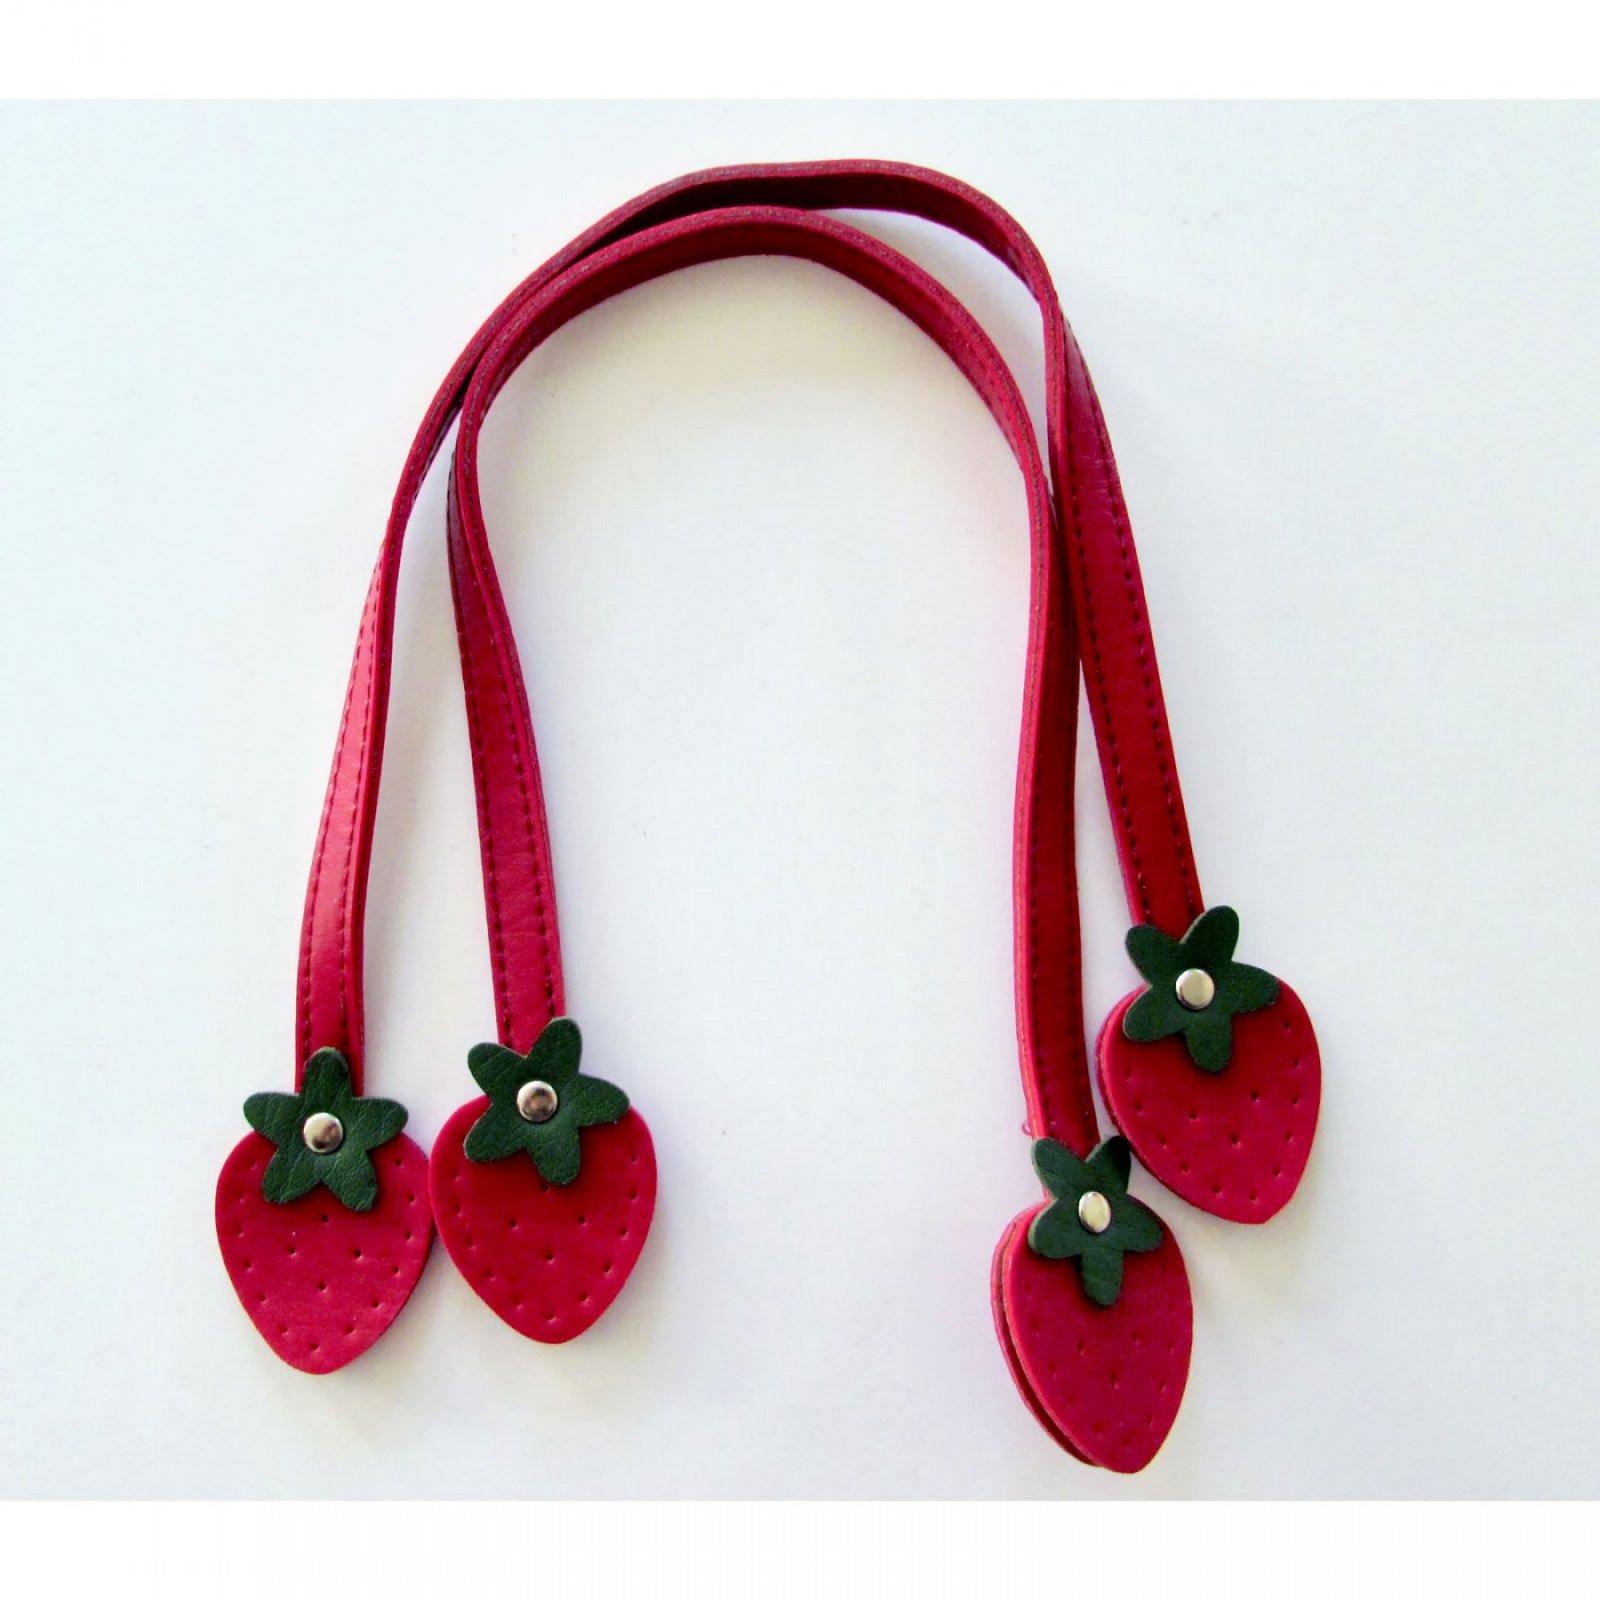 Handles - Atsuko Matsuyama - 16 Red Strawberry